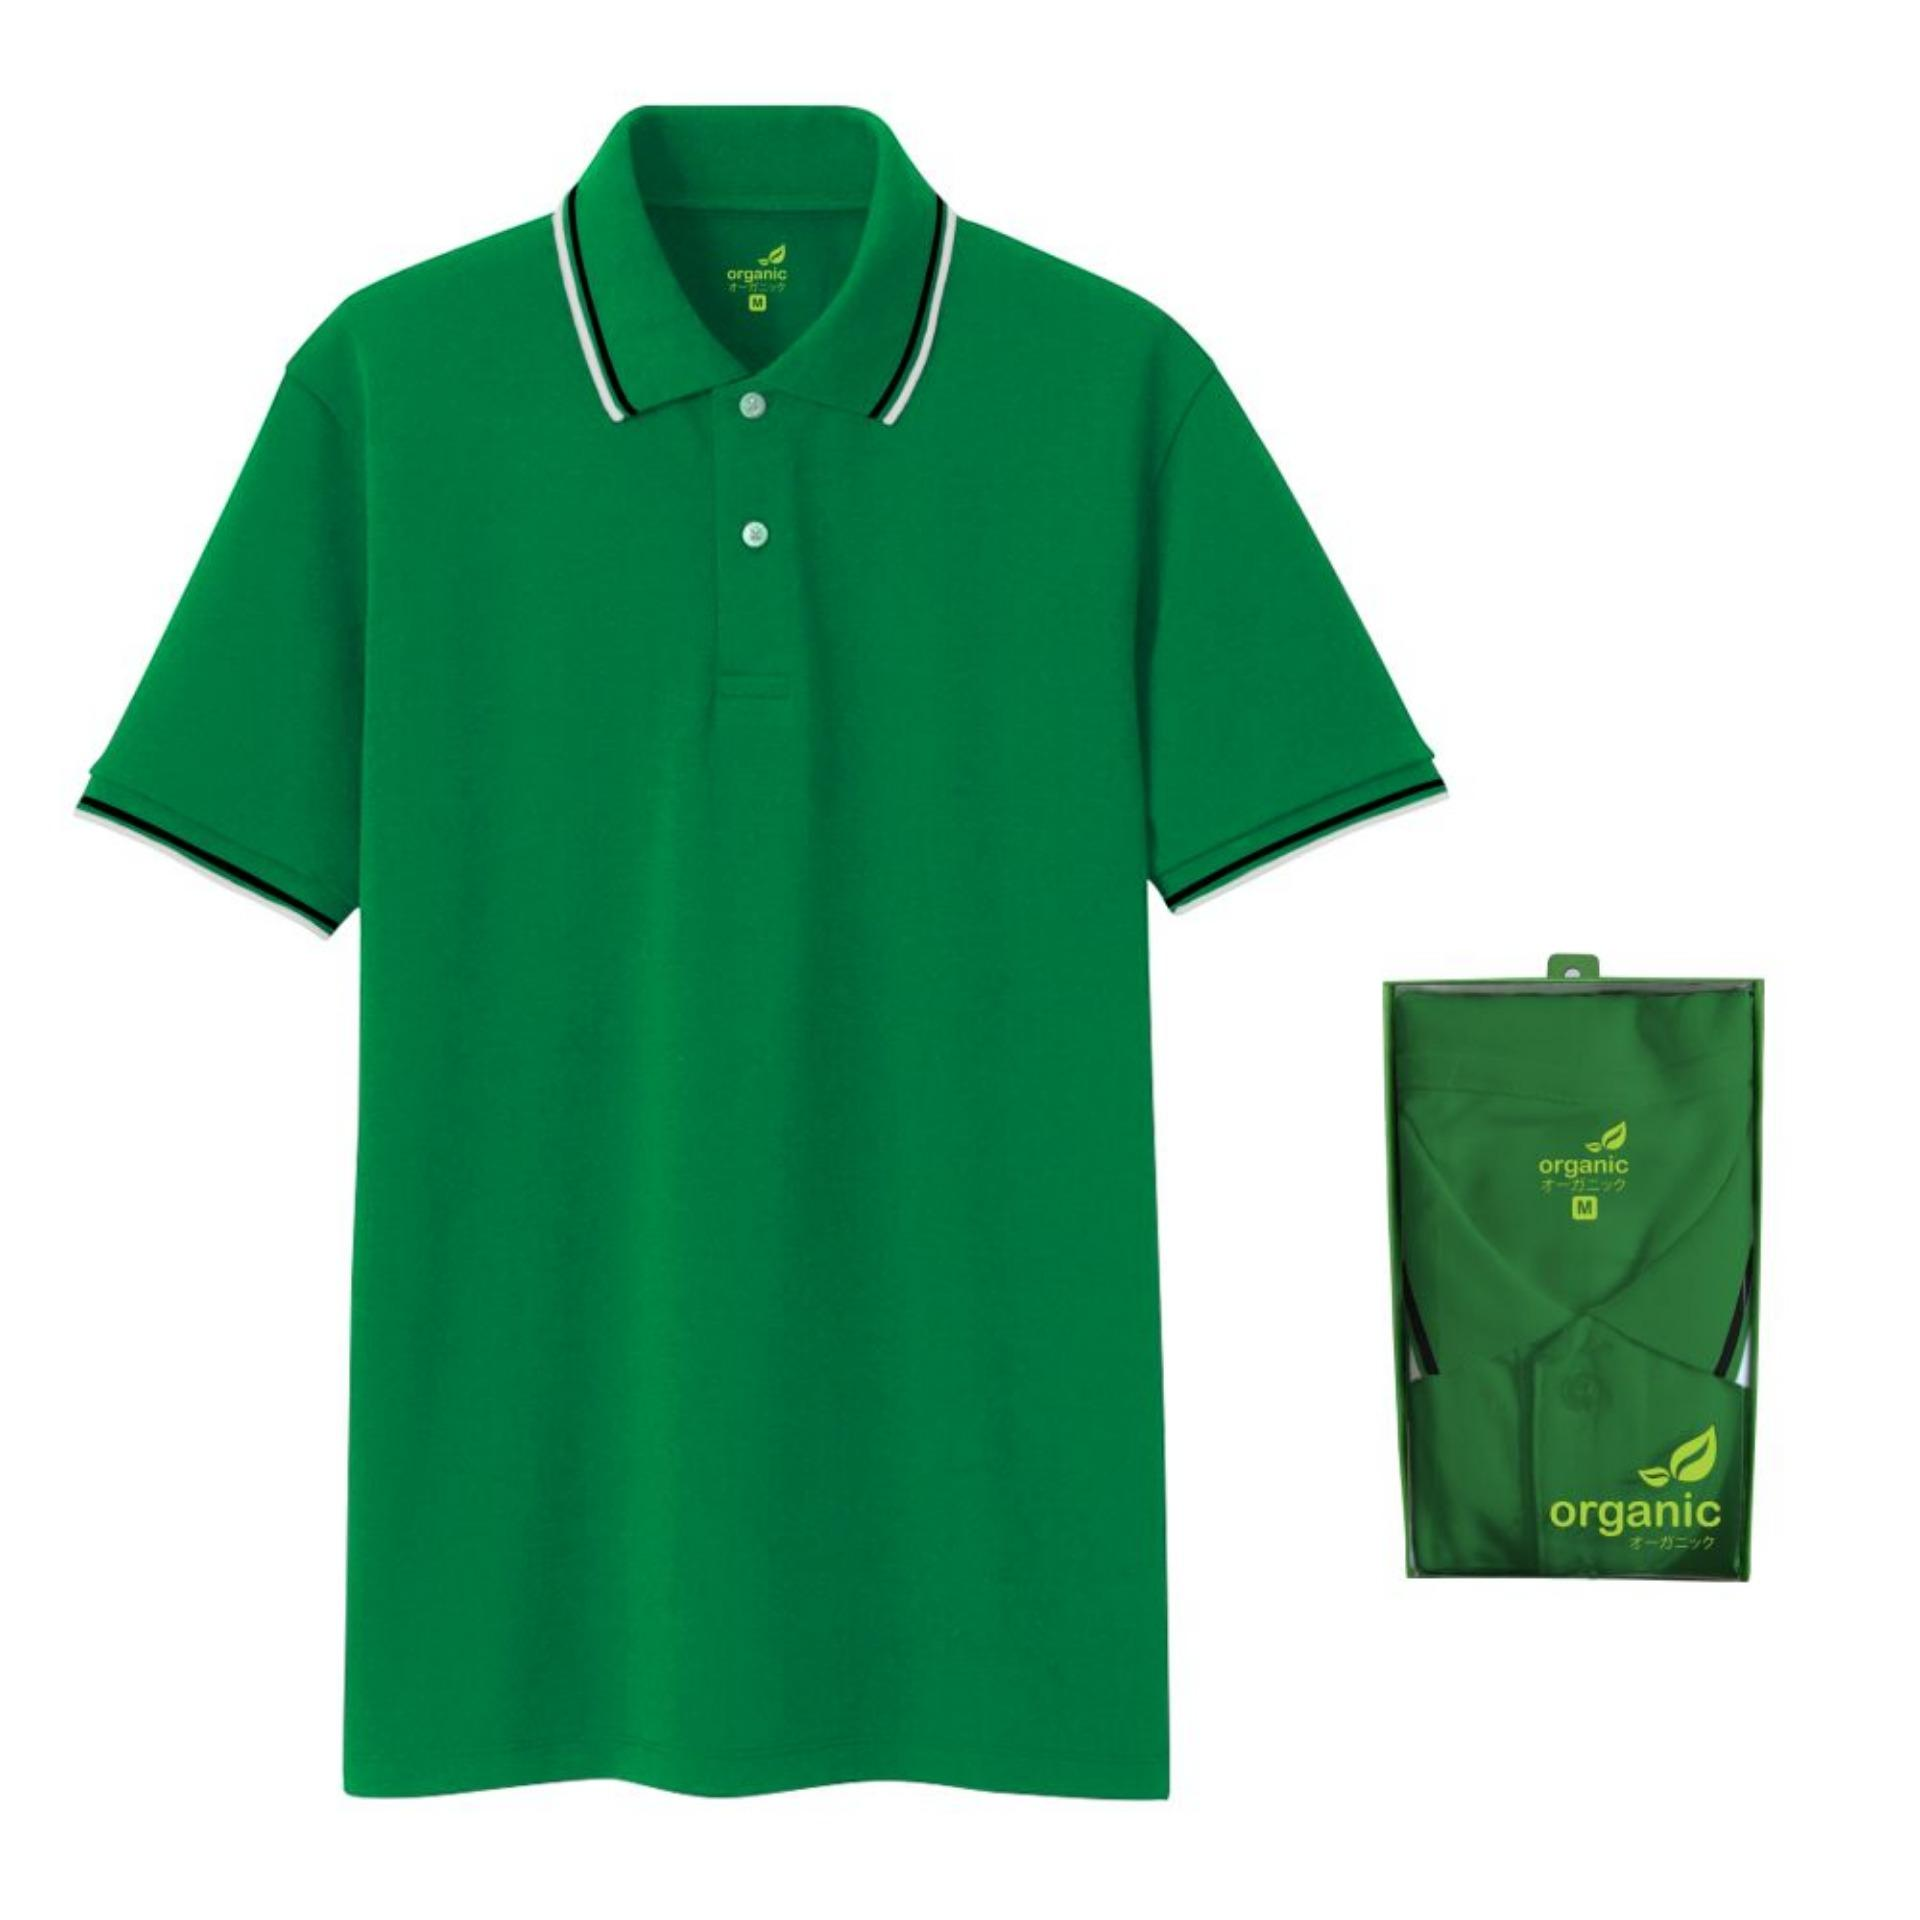 Organic Lined Plain Polo Shirt Mens